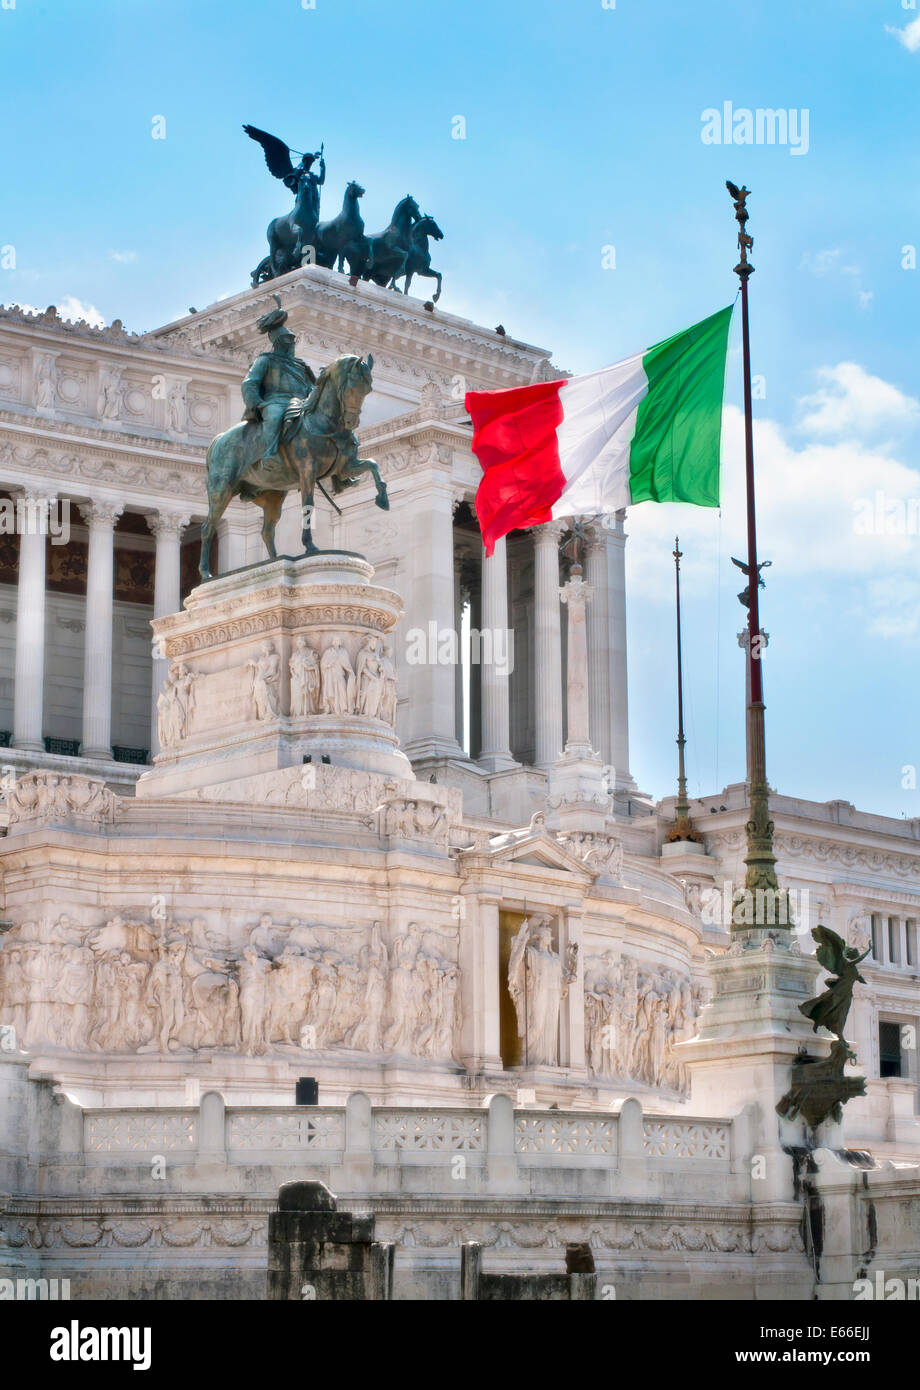 Drapeau italien dans le monument Vittoriano Photo Stock